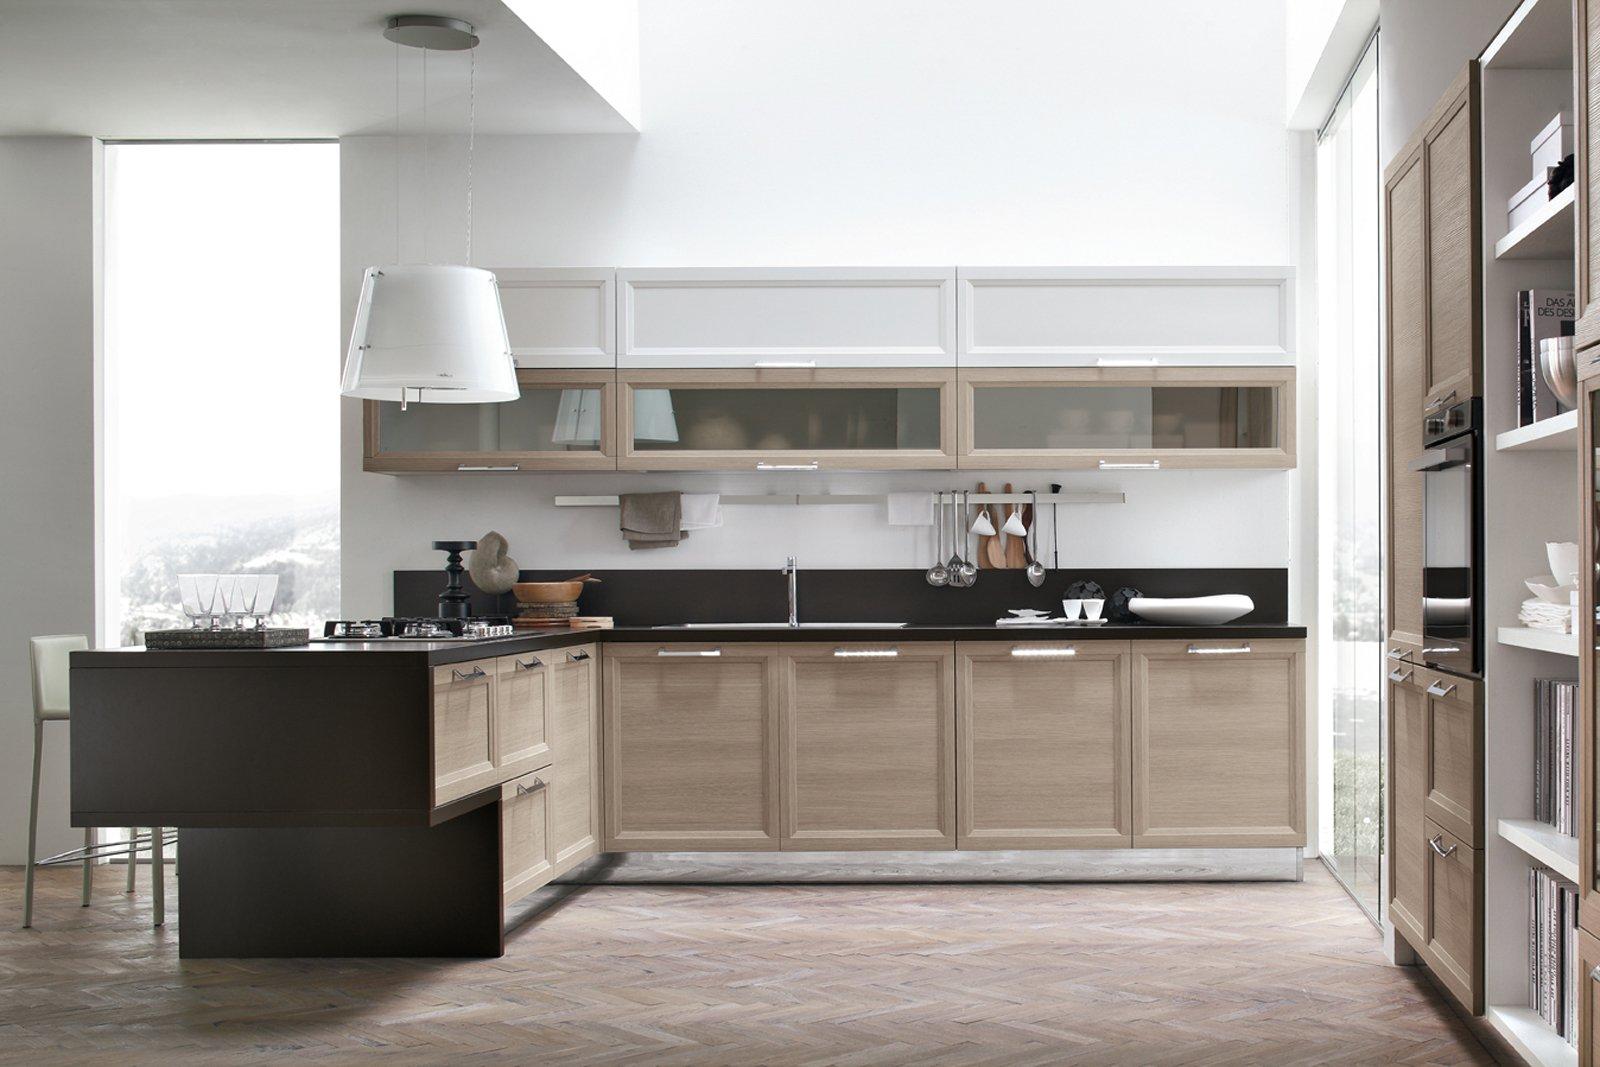 Isola cucina con sgabelli en39 regardsdefemmes for Cucine in stock